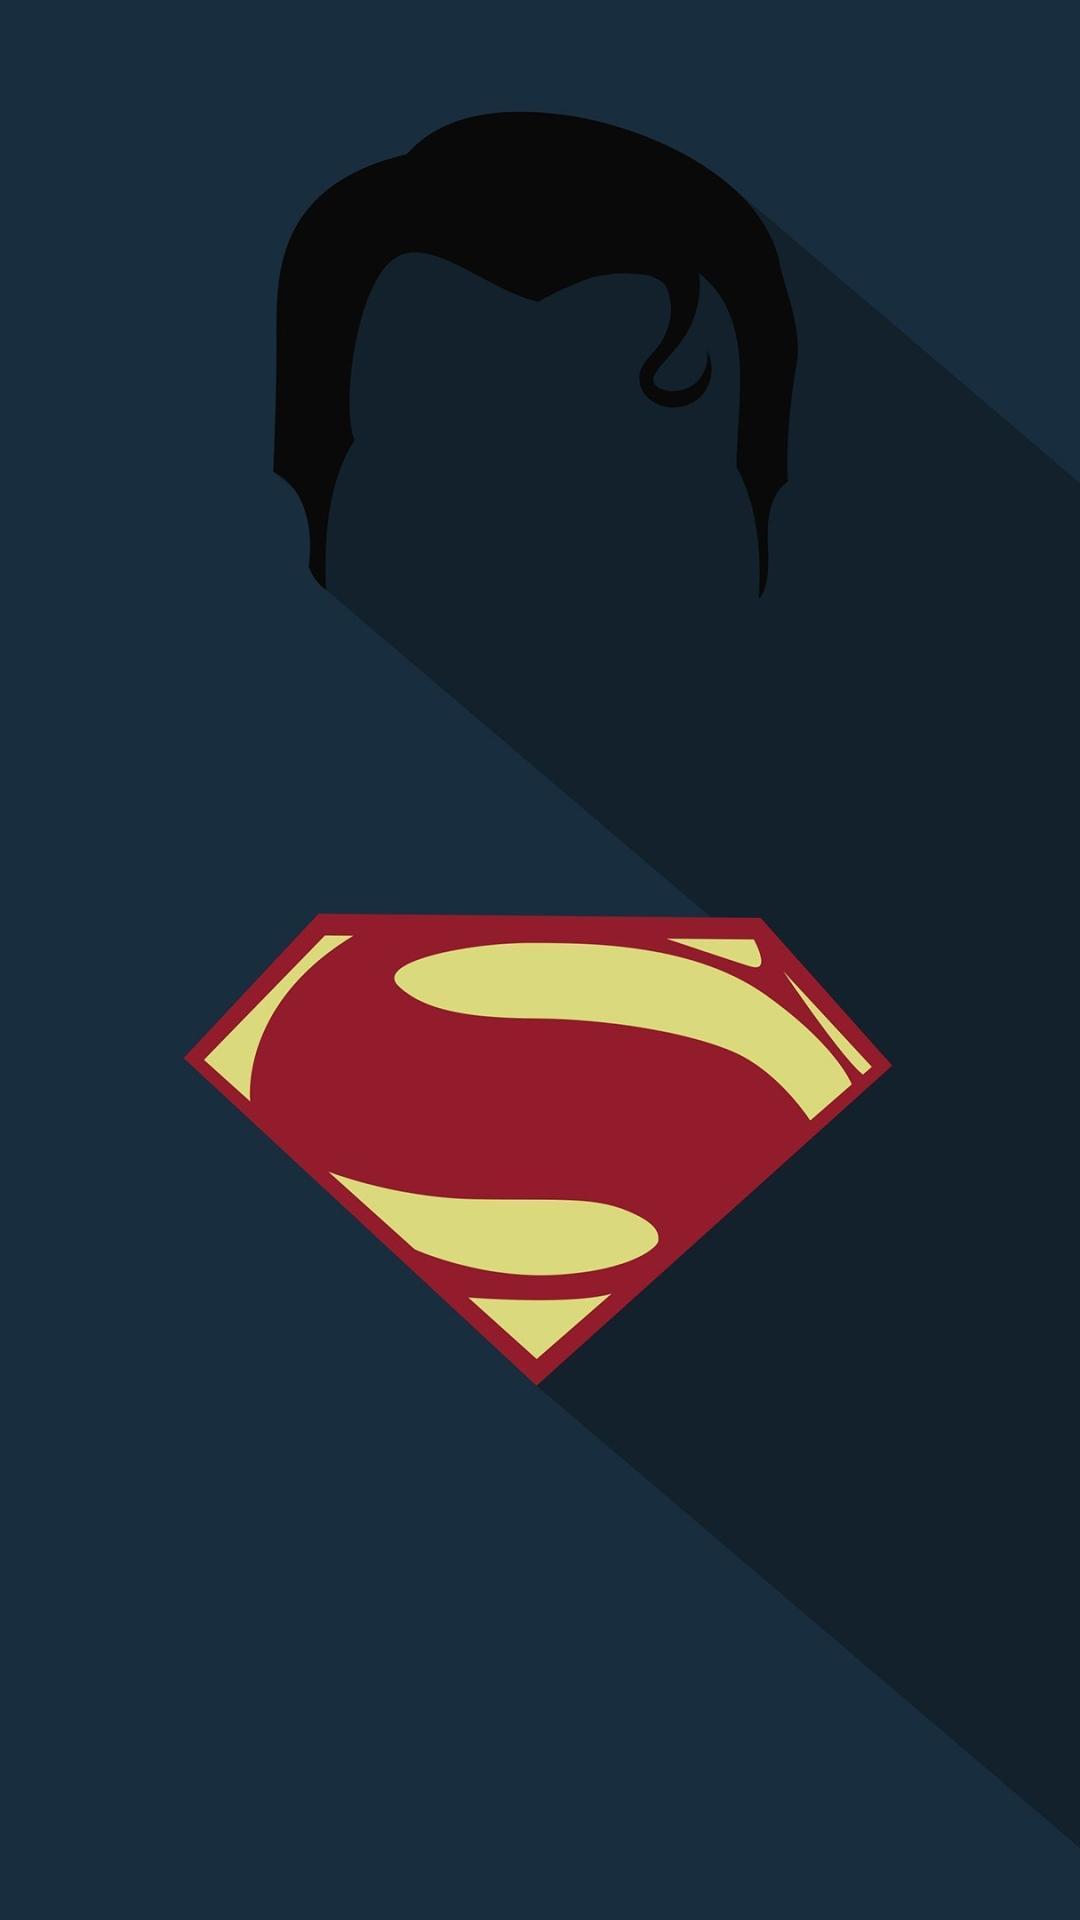 Superman AppleiPhone 7 Plus 1080x1920 57 Wallpapers